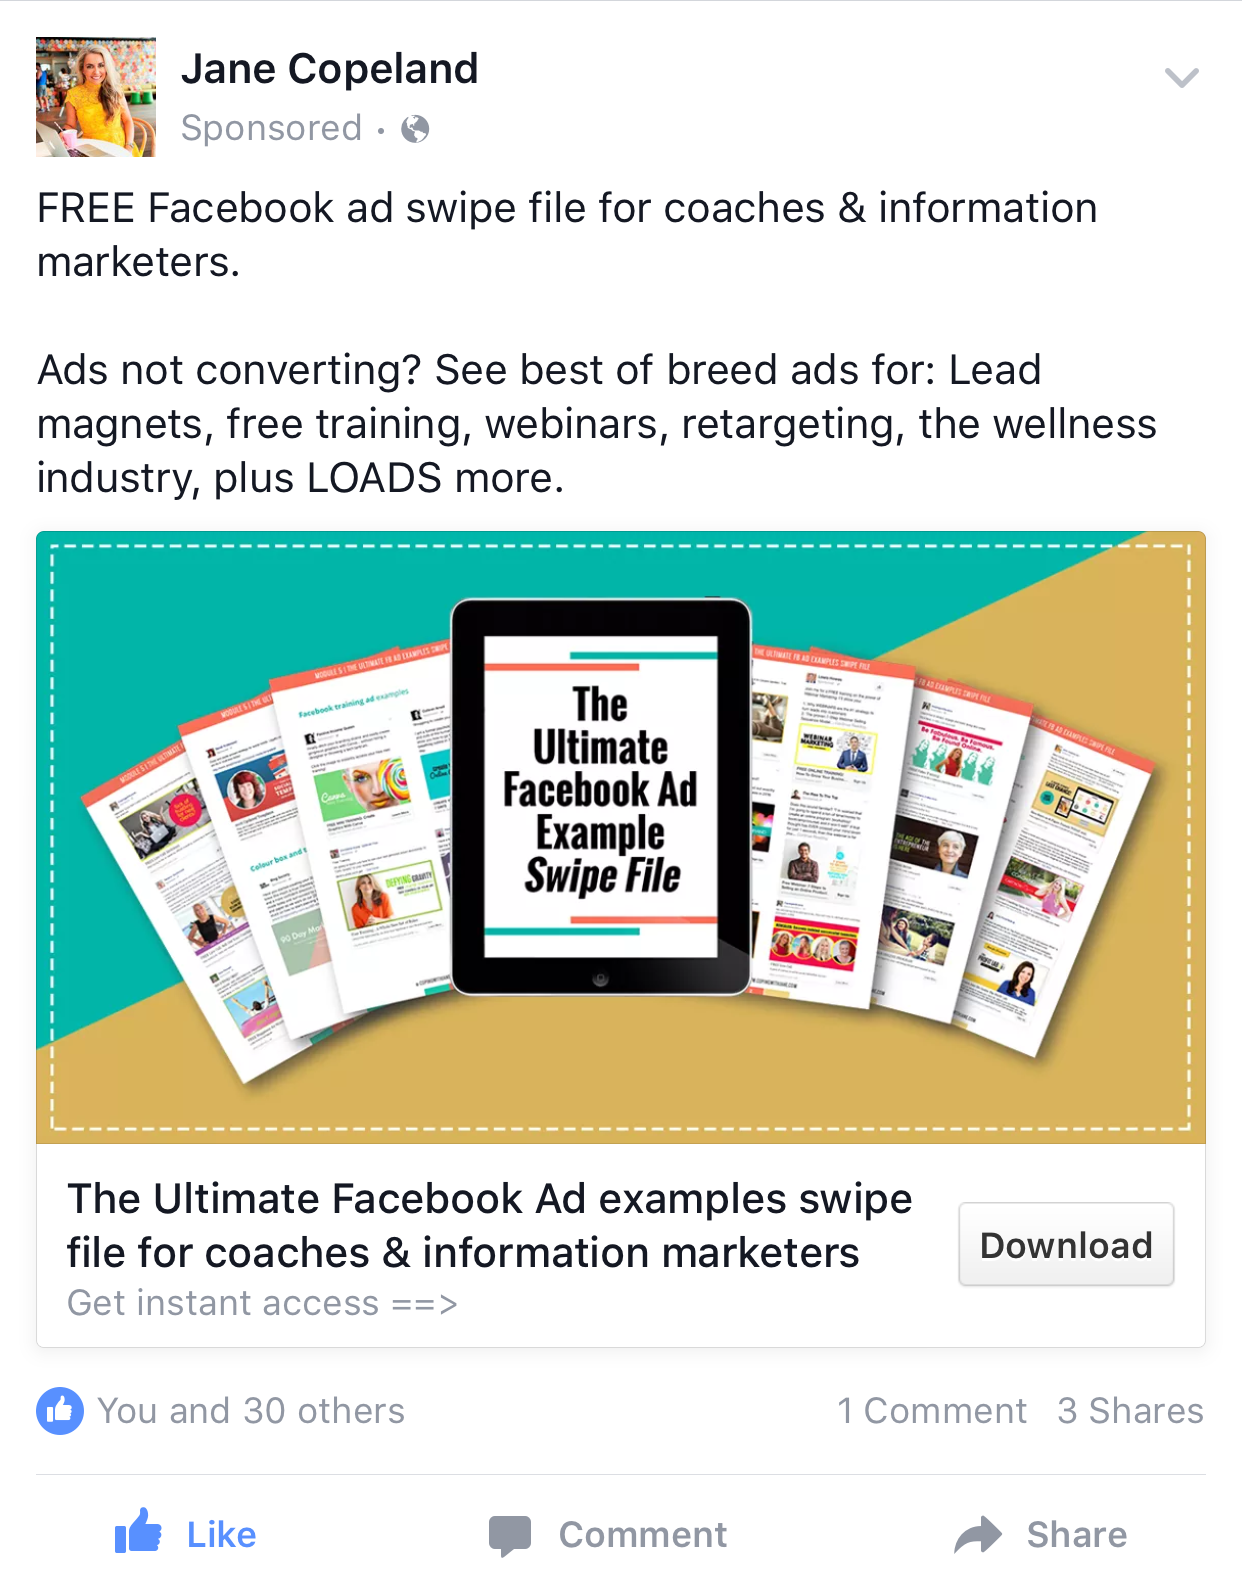 jane copeland internet entrepreneur ad on facebook facebook ad jane copeland internet entrepreneur ad on facebook